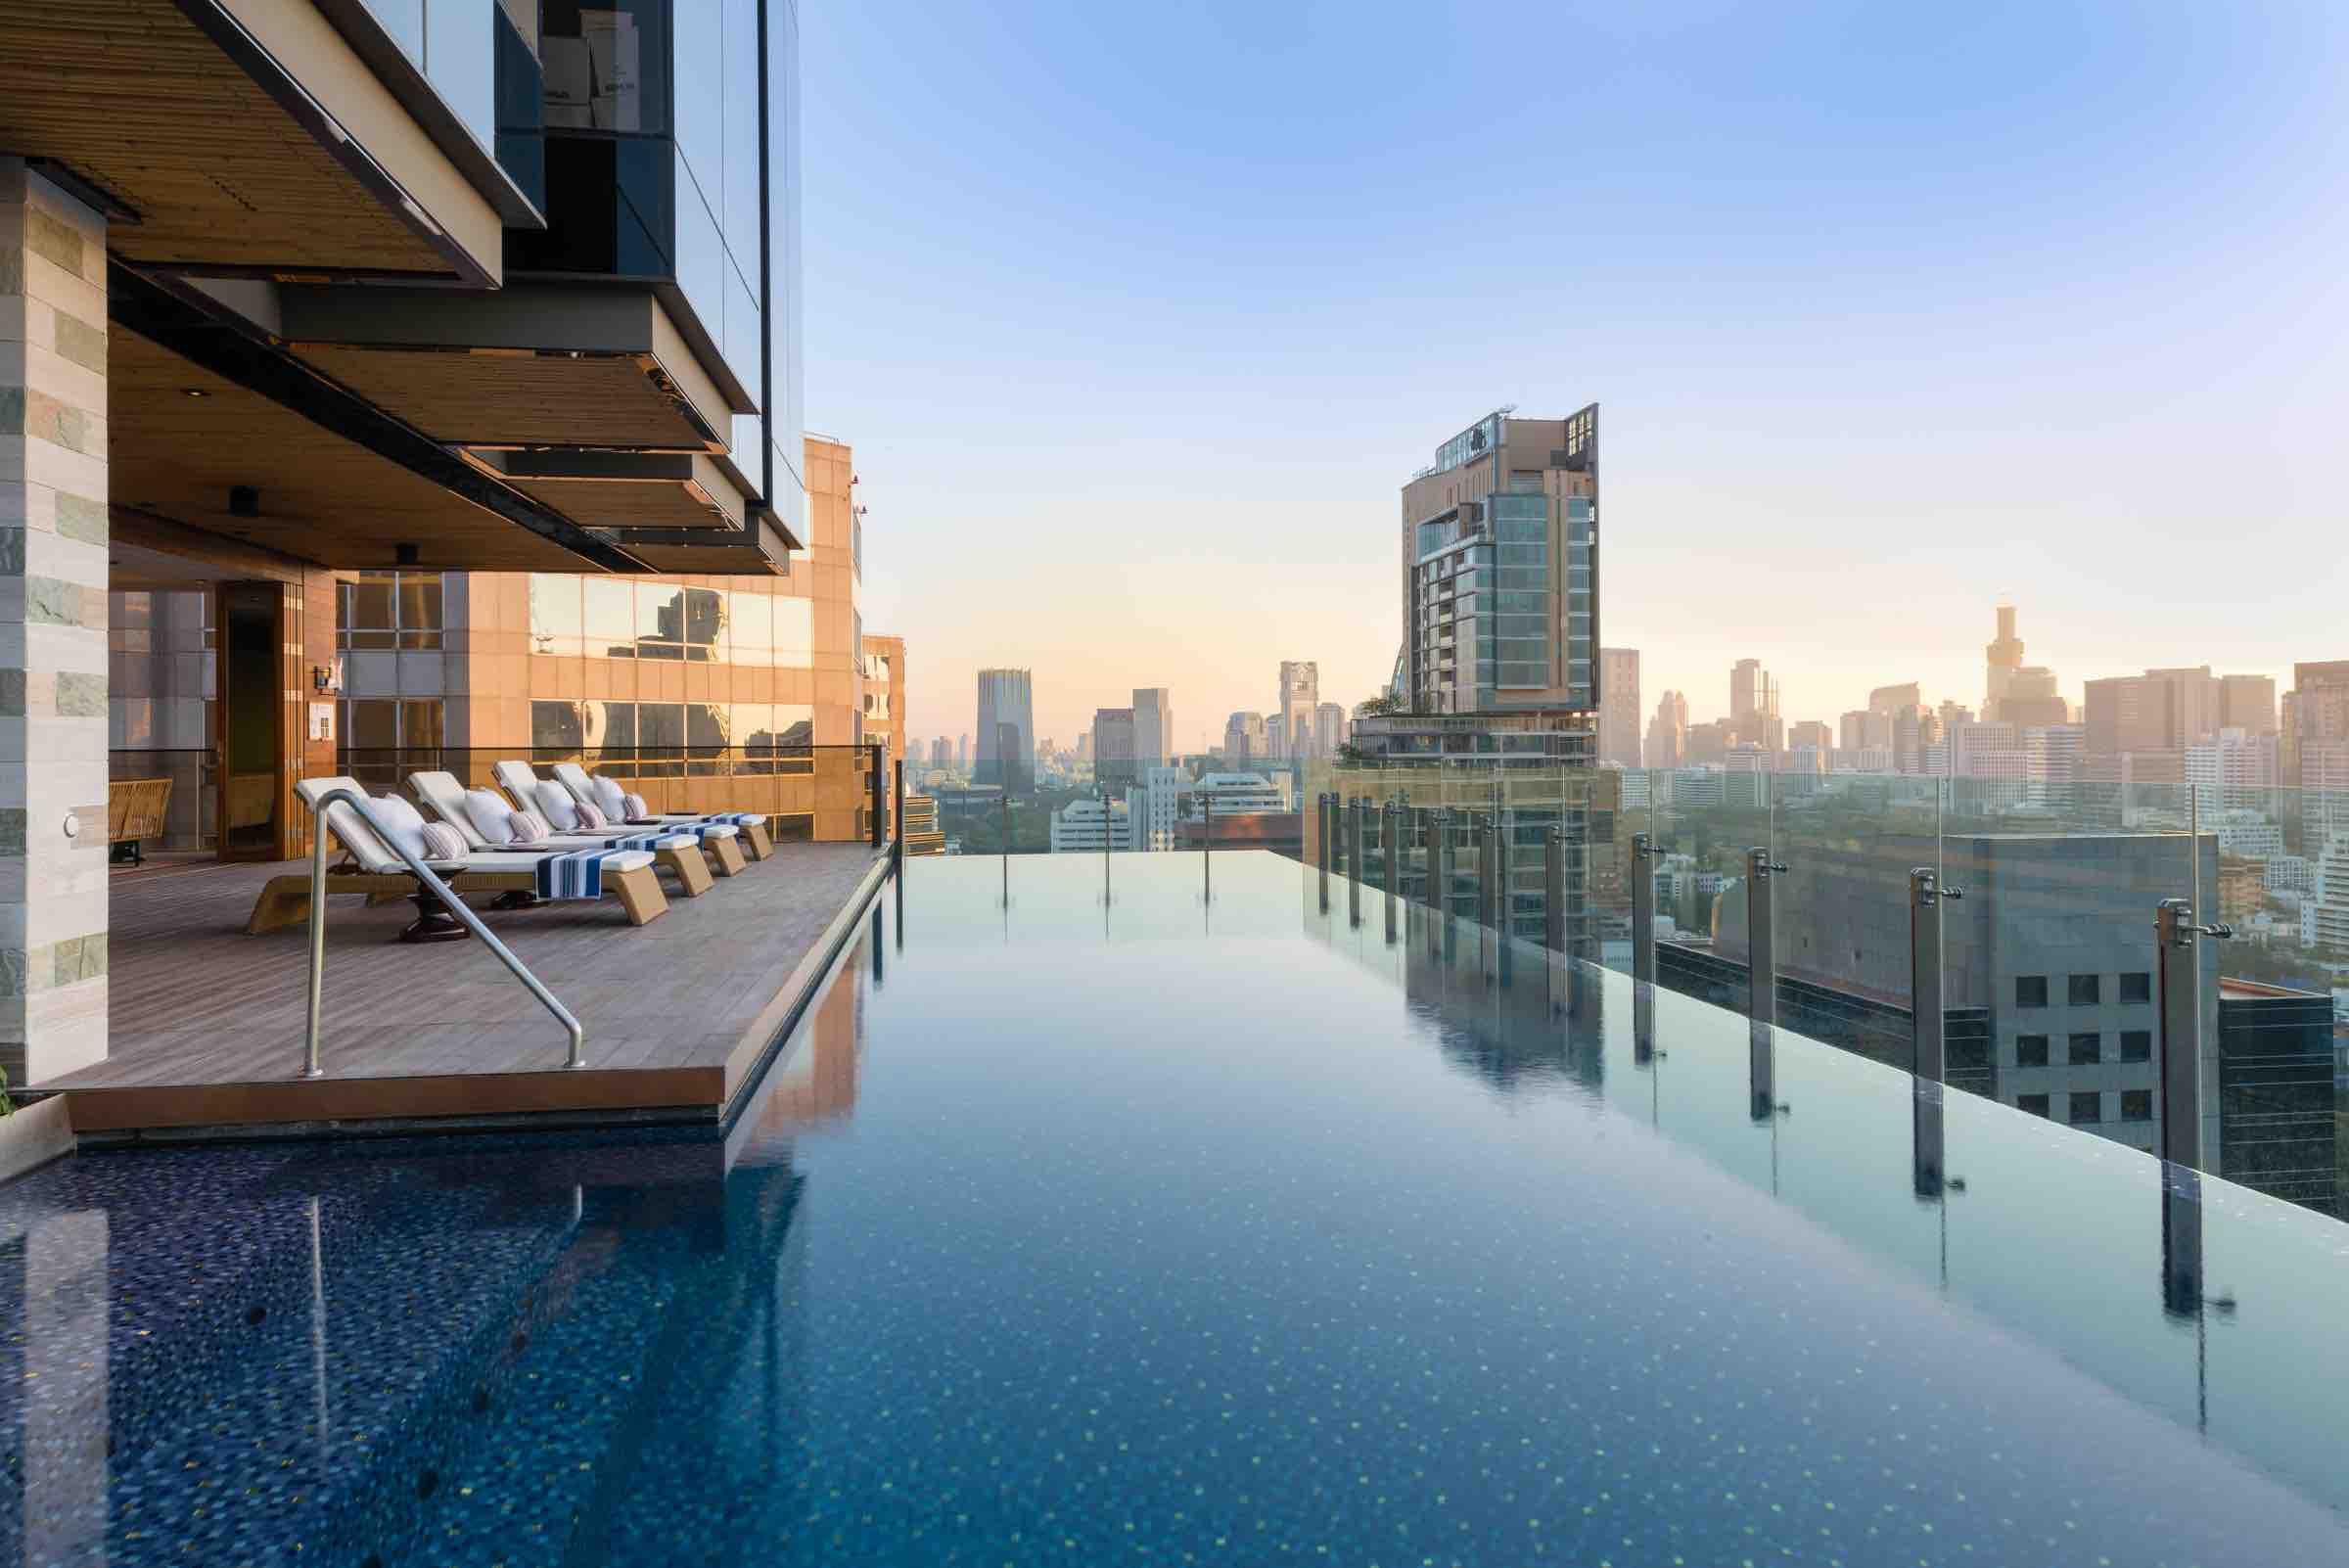 Hotel Indigo Bangkok Infinity Pool - AspirantSG